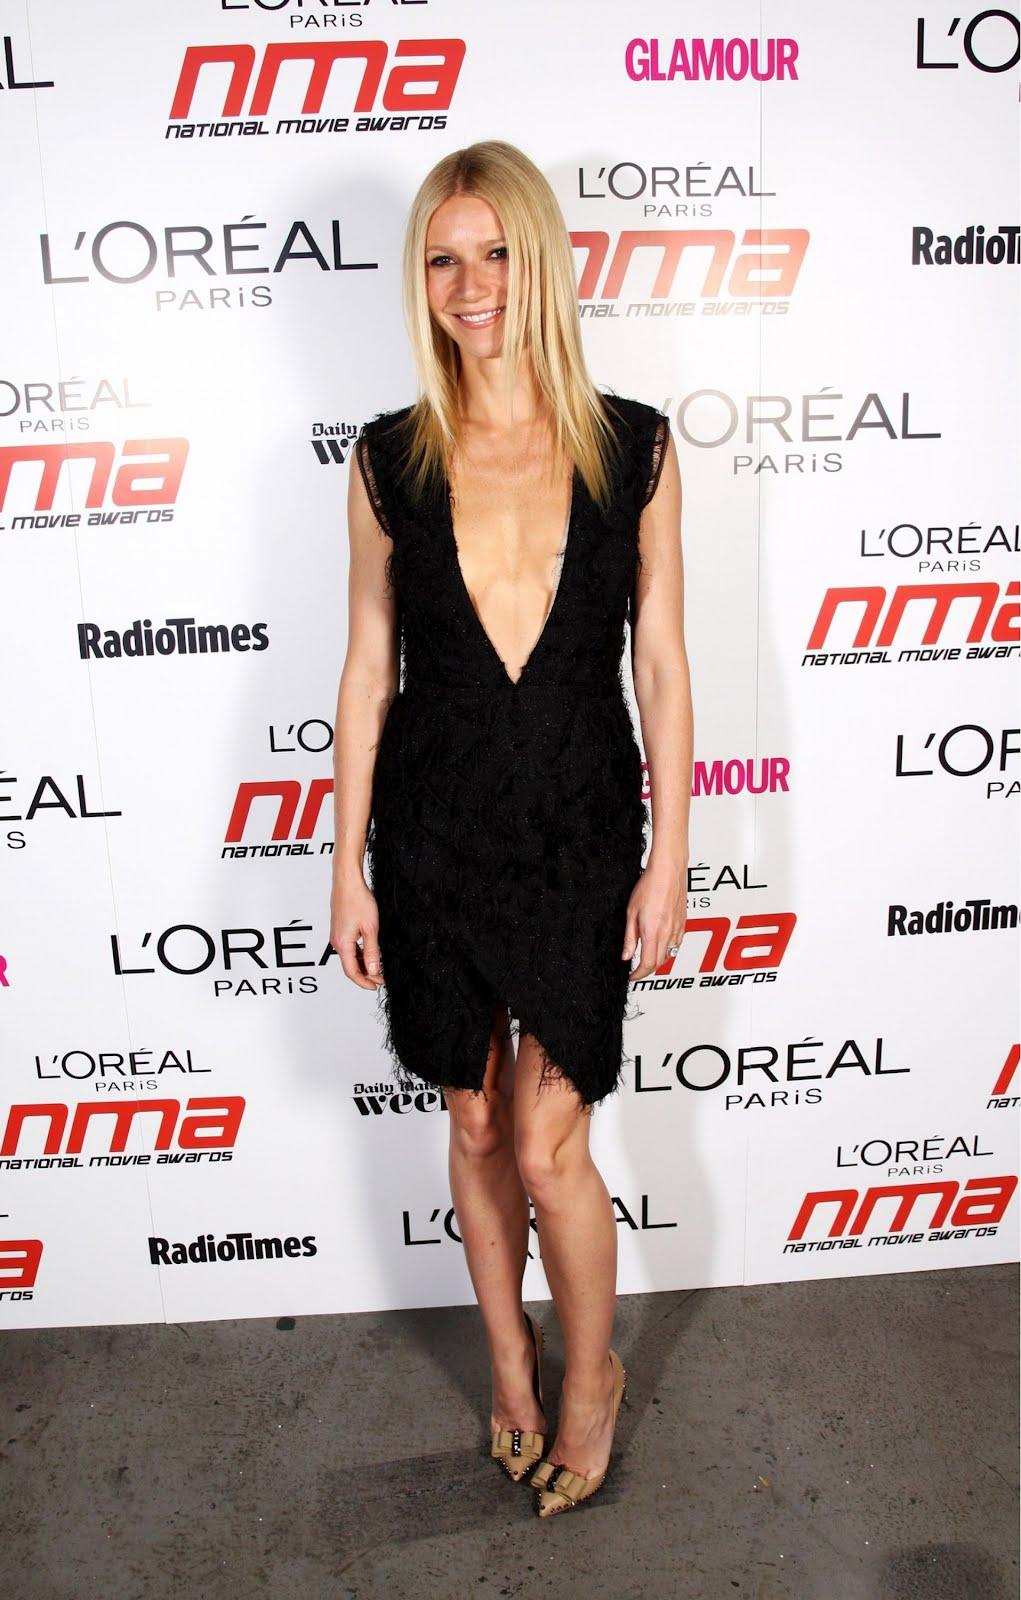 Cleavage Gwyneth Paltrow nude photos 2019